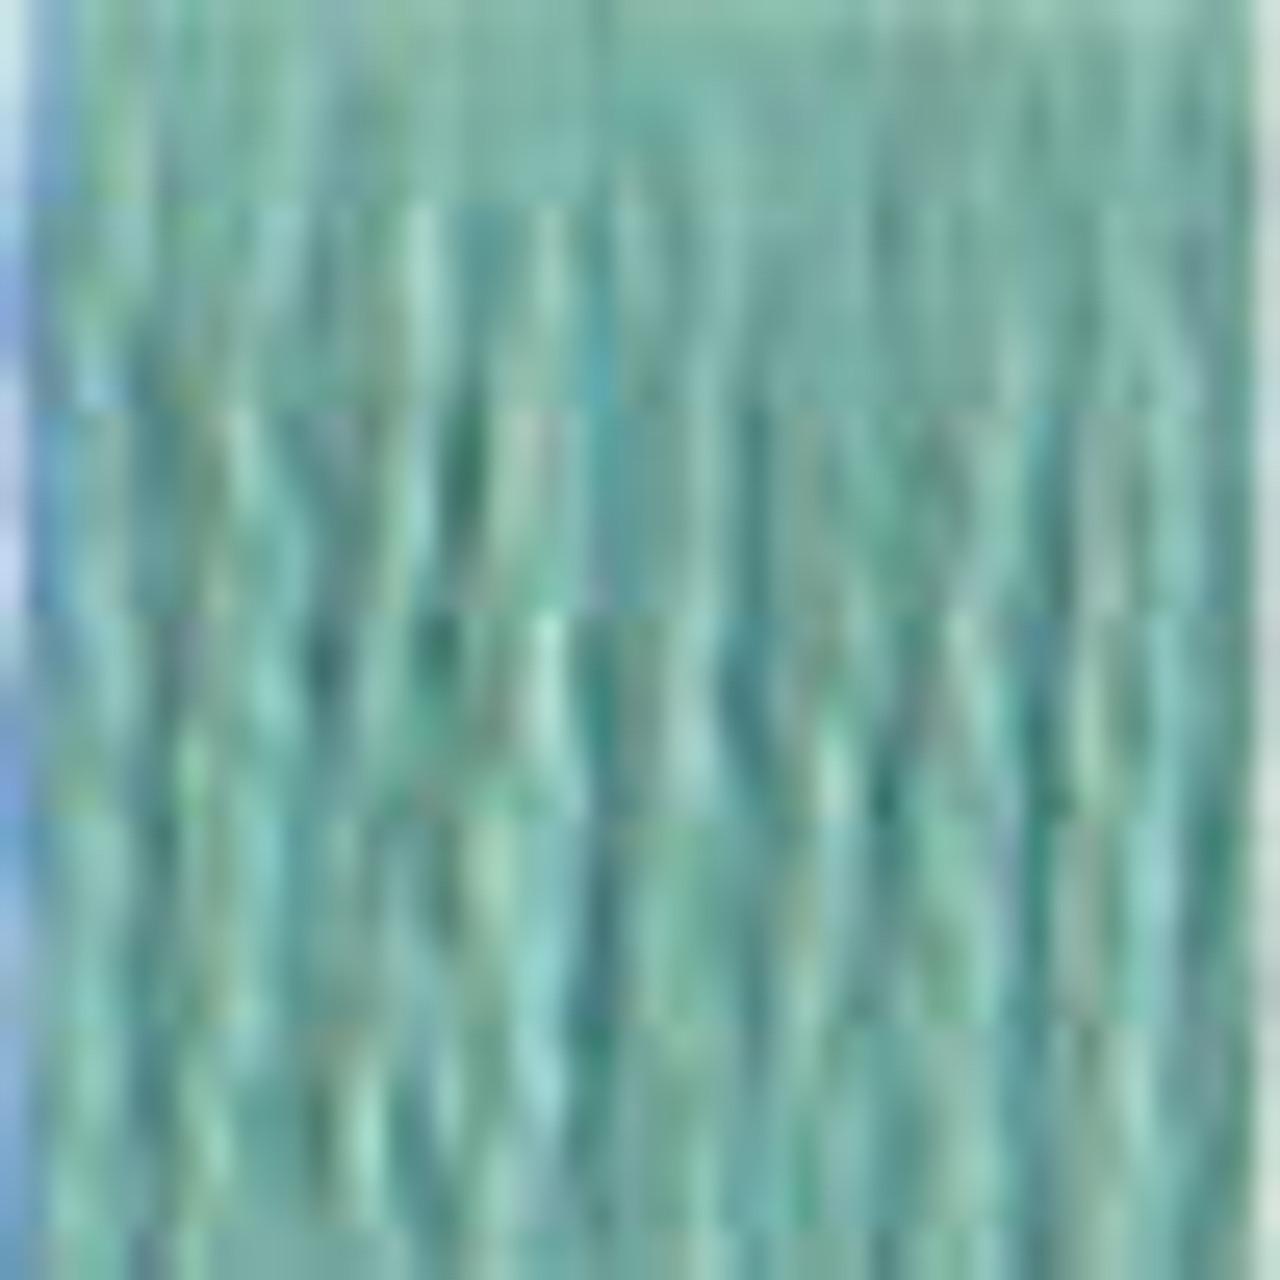 DMC # 503 Medium Blue Green Floss / Thread